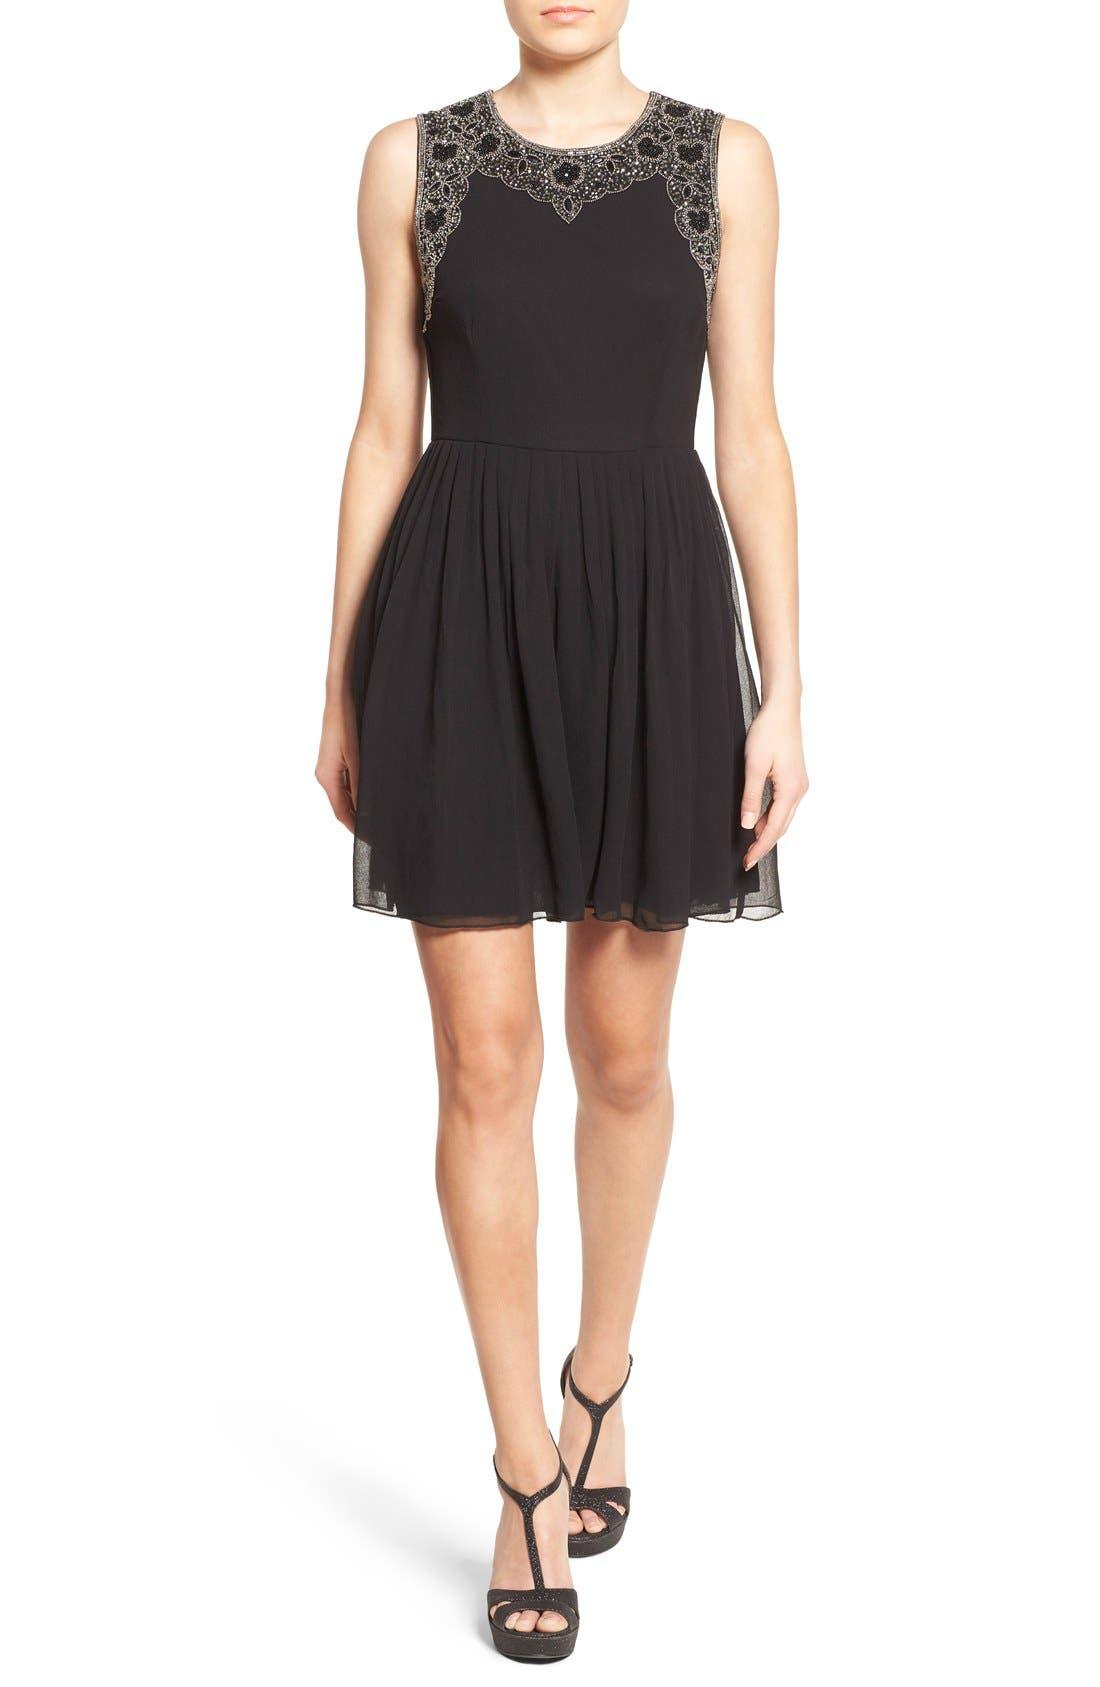 Alternate Image 1 Selected - Lace & Beads 'Becky' Embellished Skater Dress